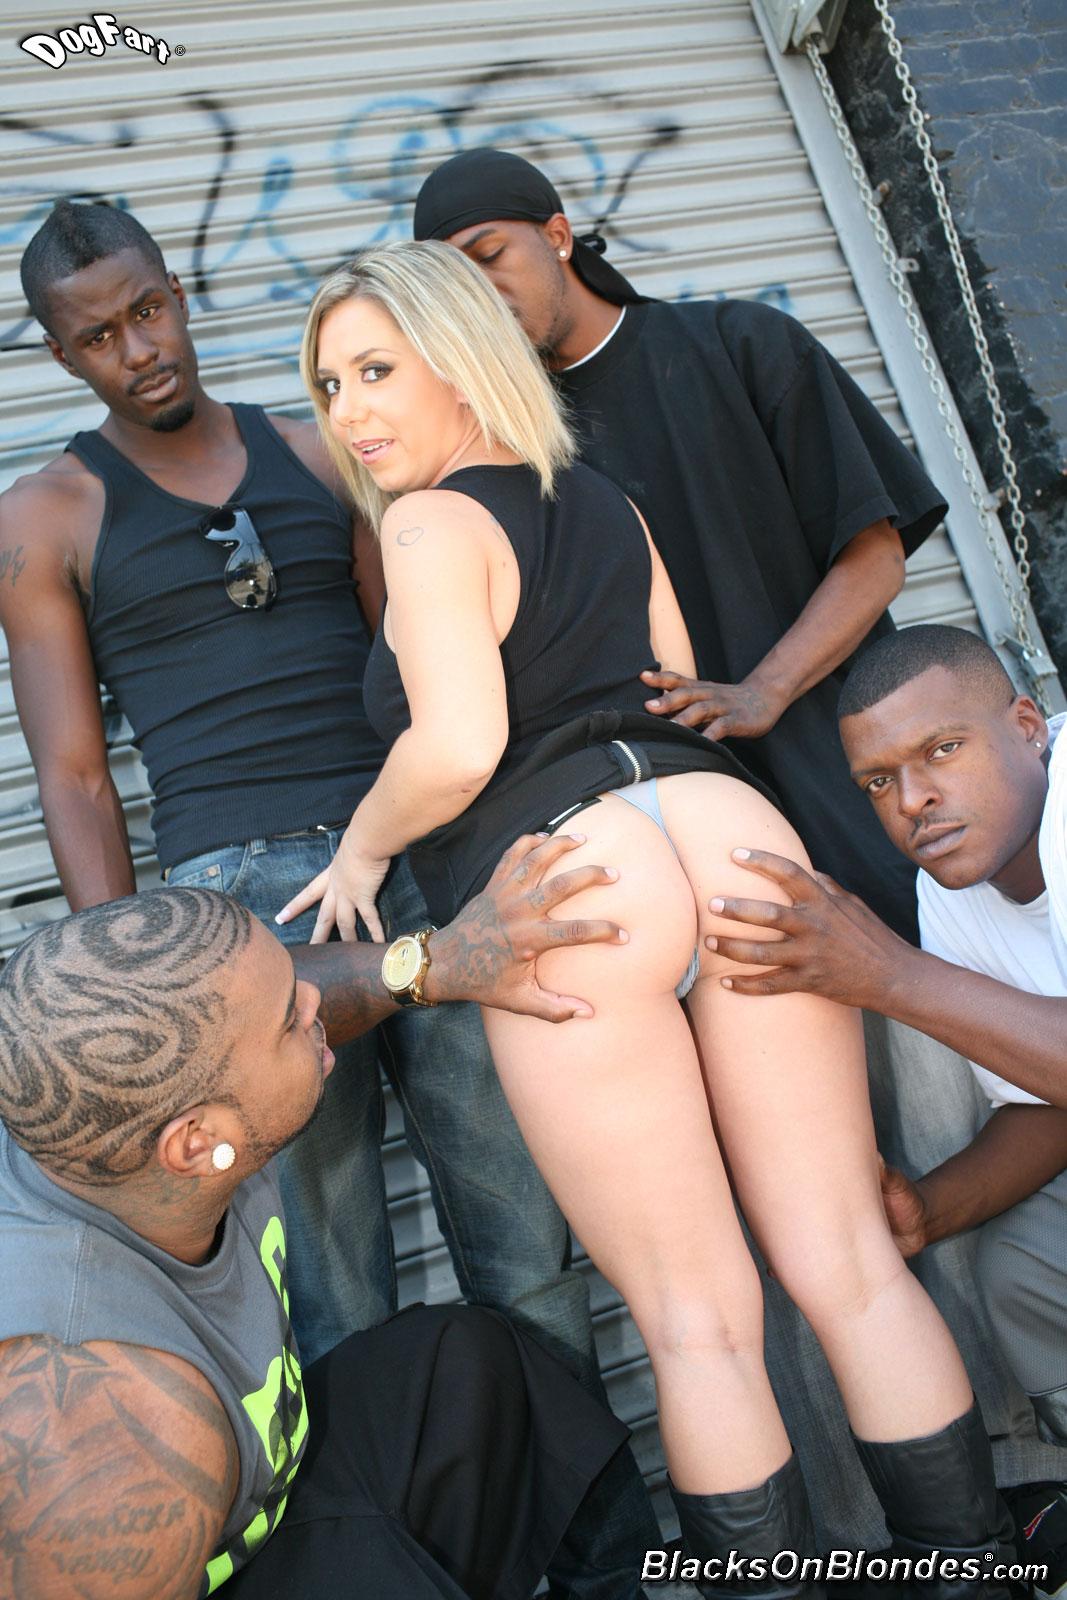 Abigaile johnson gets gangbanged by black cocks - 3 1